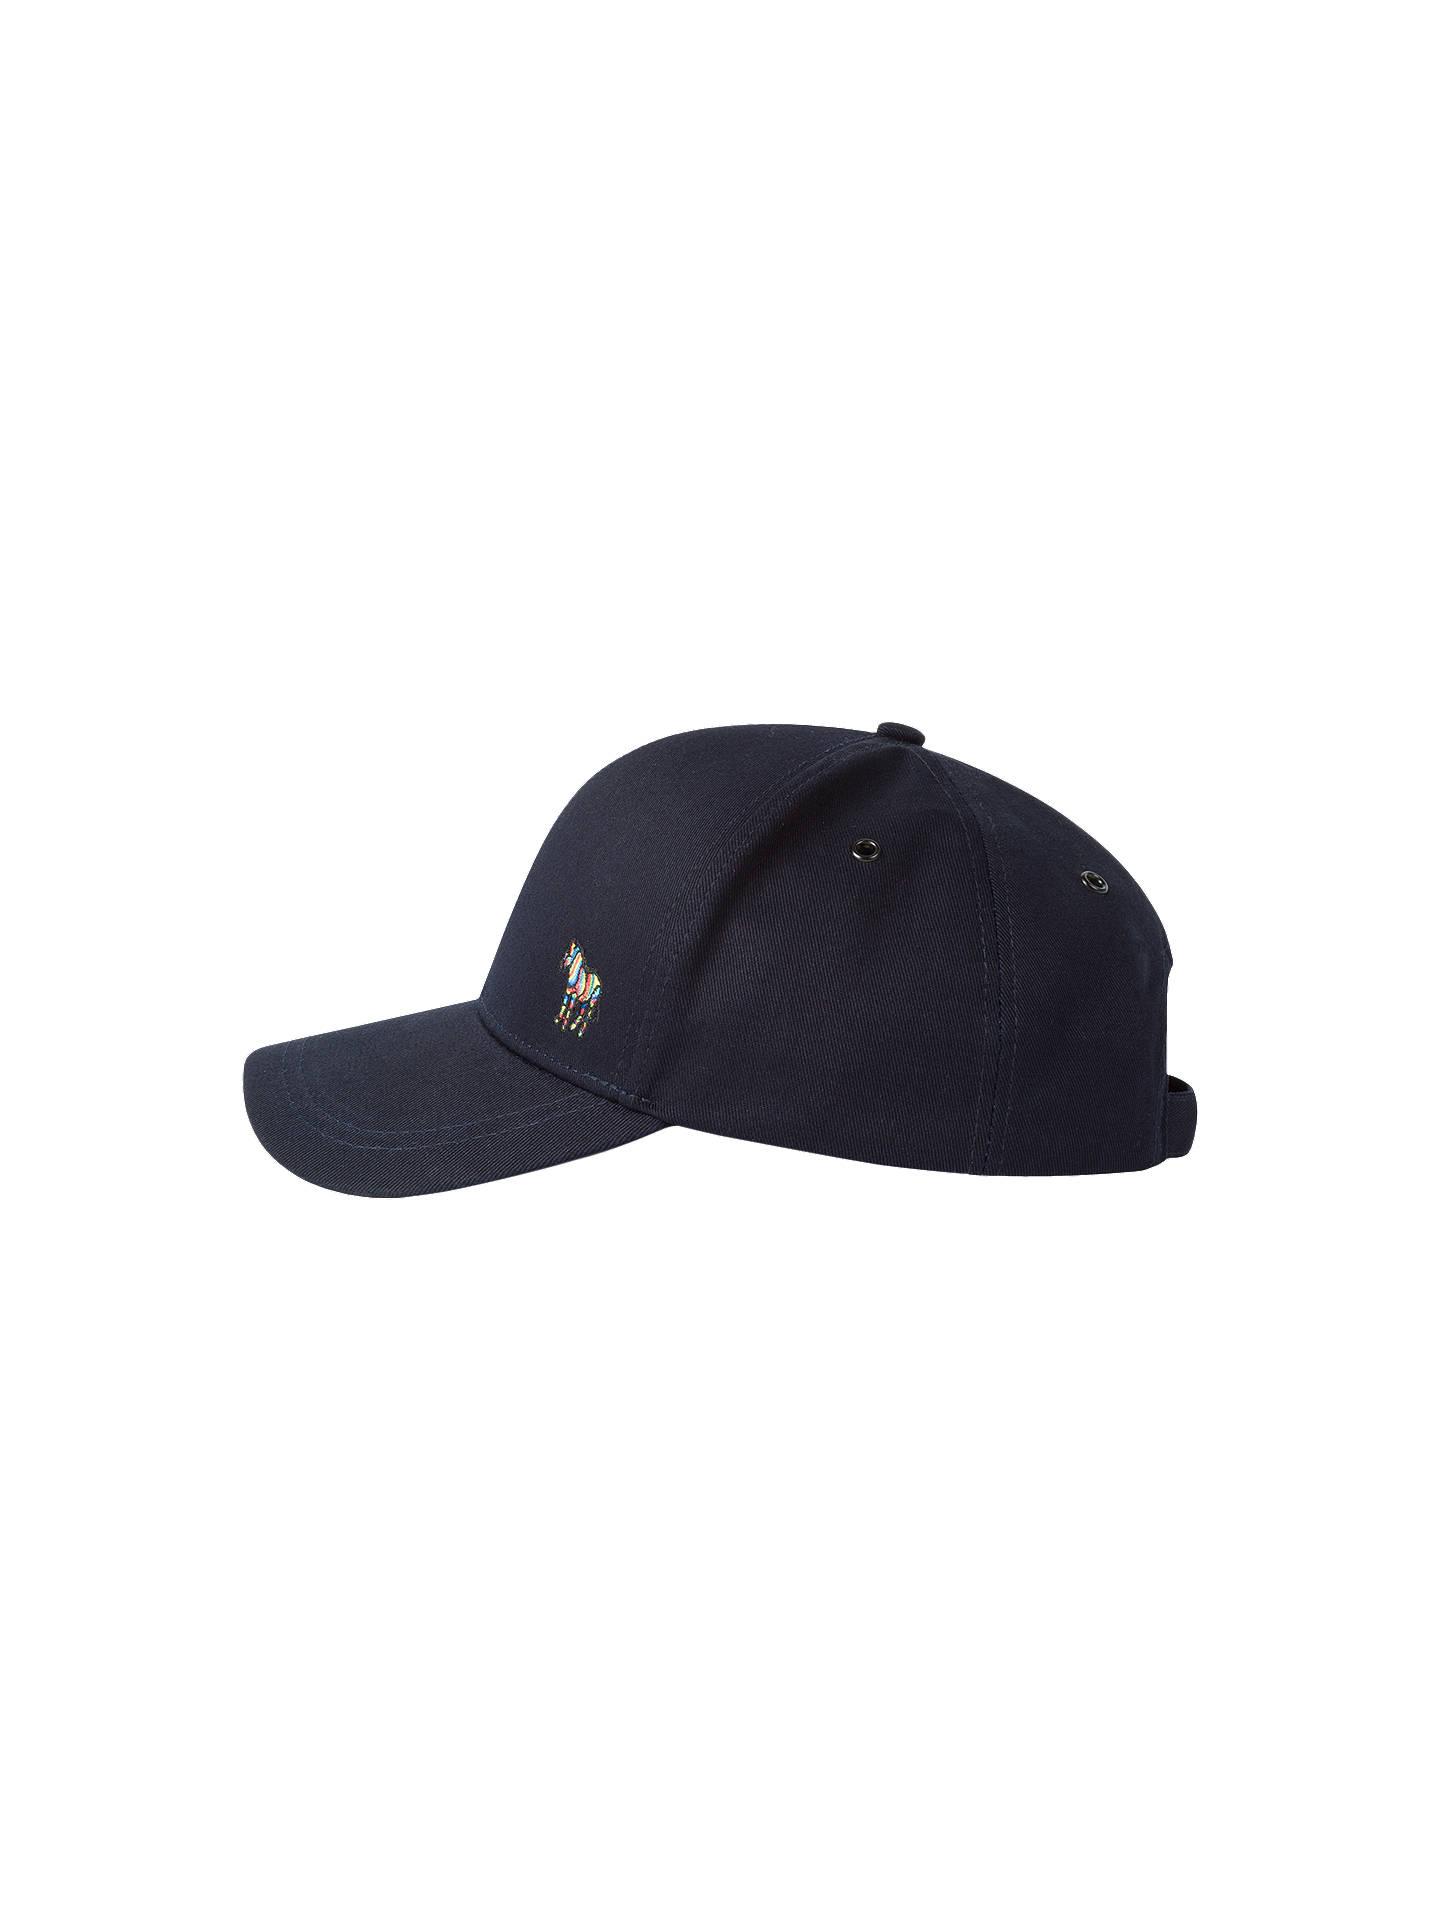 bcf74857a1cd14 Buy Paul Smith Zebra Baseball Cap, One Size, Navy Online at johnlewis.com  ...